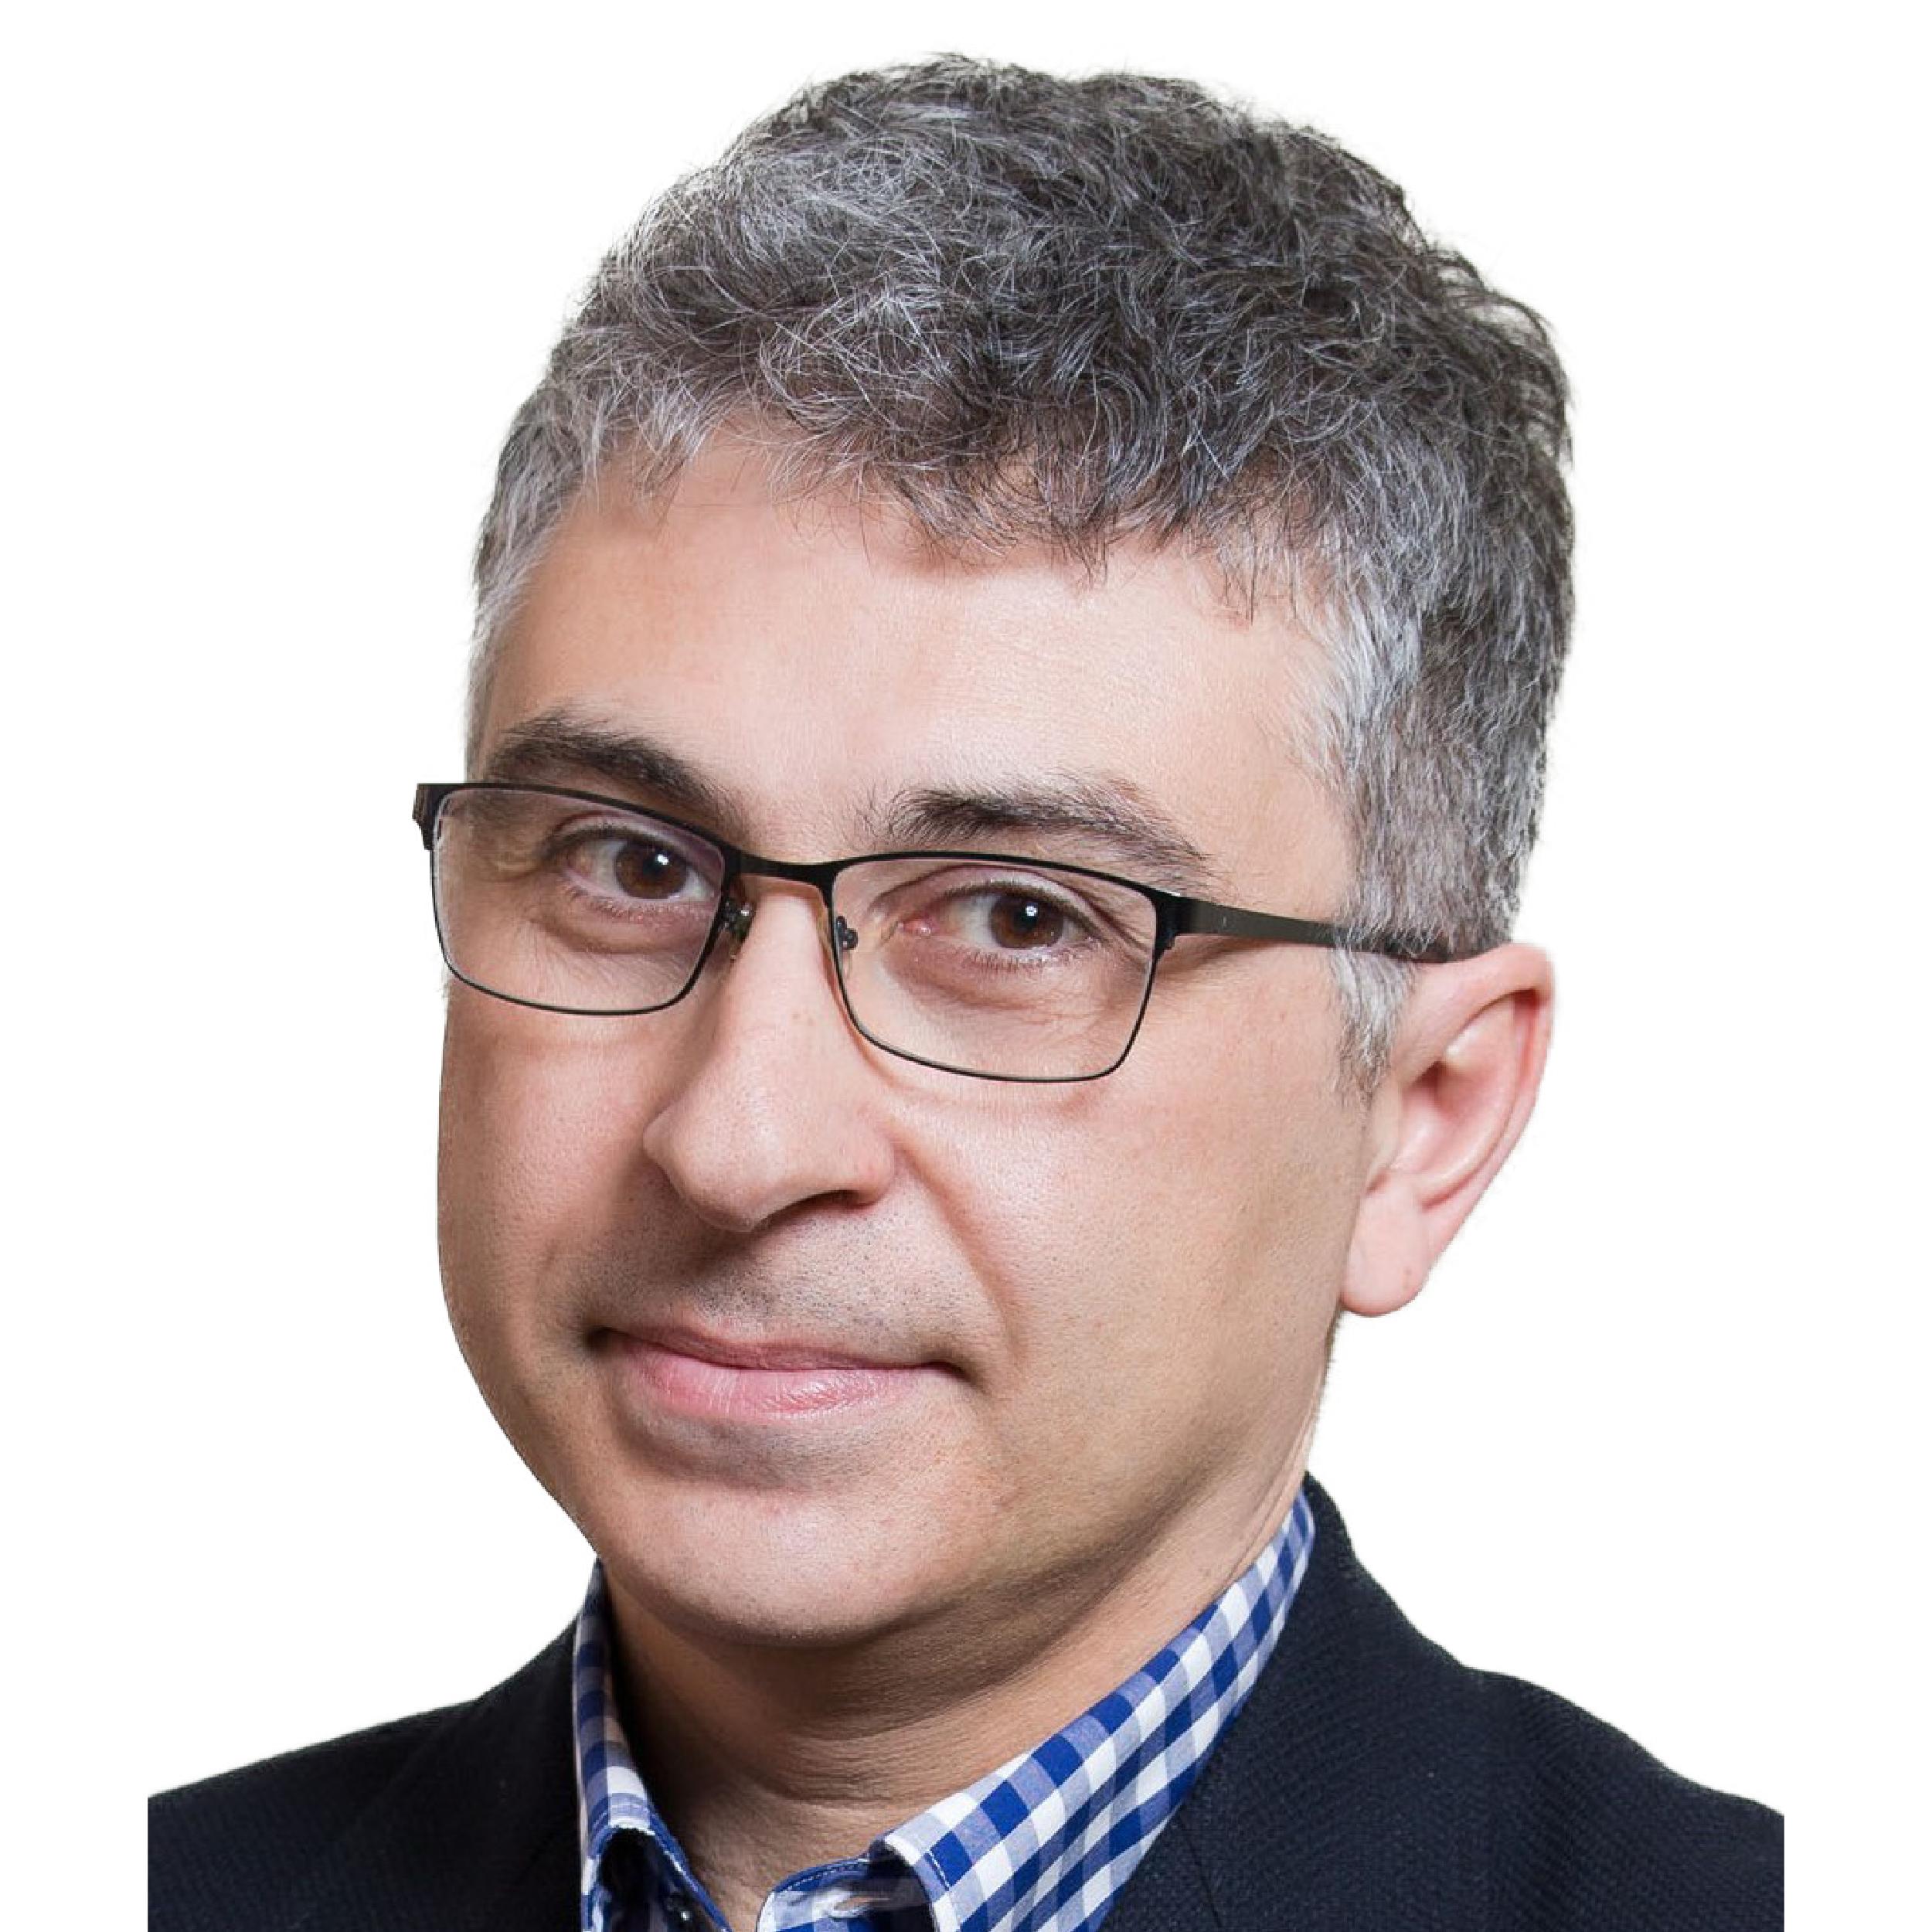 "<a href=""https://www.linkedin.com/in/cesare-spadoni-6081b41/ ""target=""_blank"">Cesare Spadoni →</a><strong></strong><strong>Richi Research Advisor</strong>"